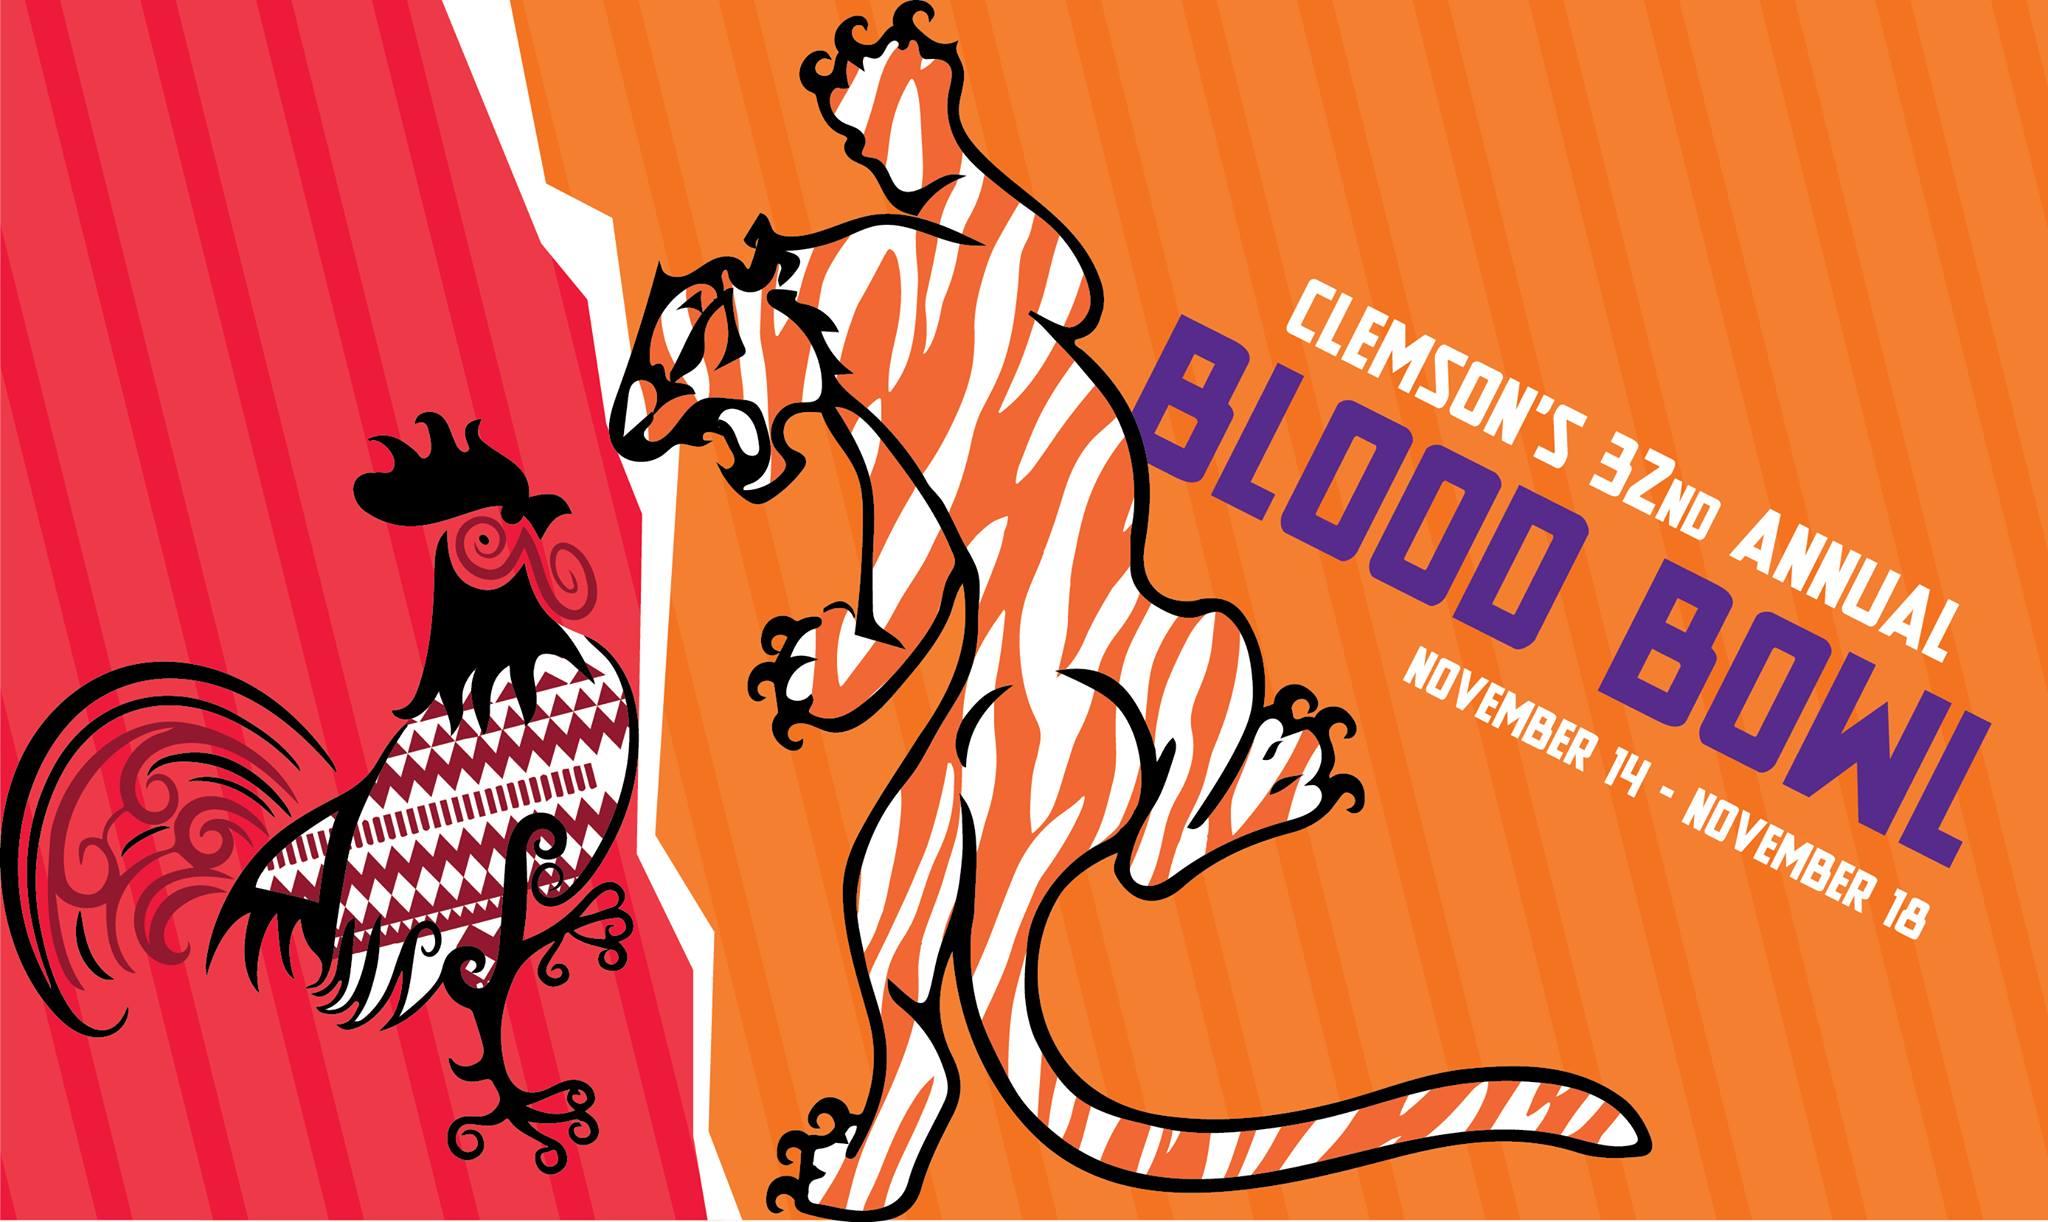 Blood Bowl artwork (Courtesy: Alpha Phi Omega - Gamma Lambda/ Facebook)